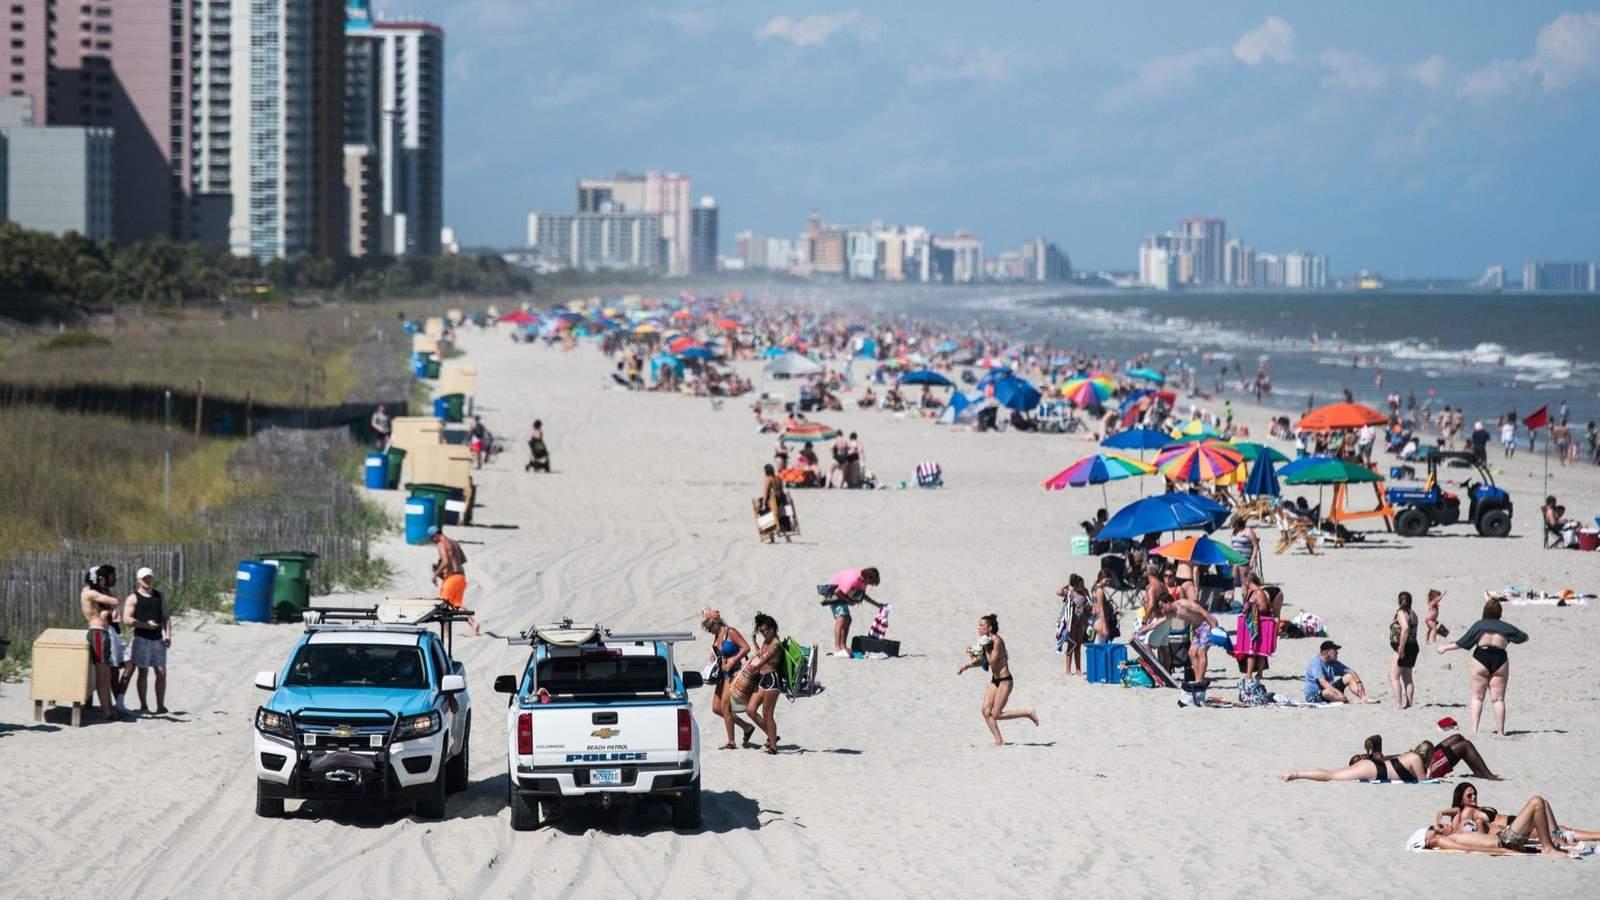 Roanoke area coronavirus cases linked to Myrtle Beach nearly double overnight - WSLS 10